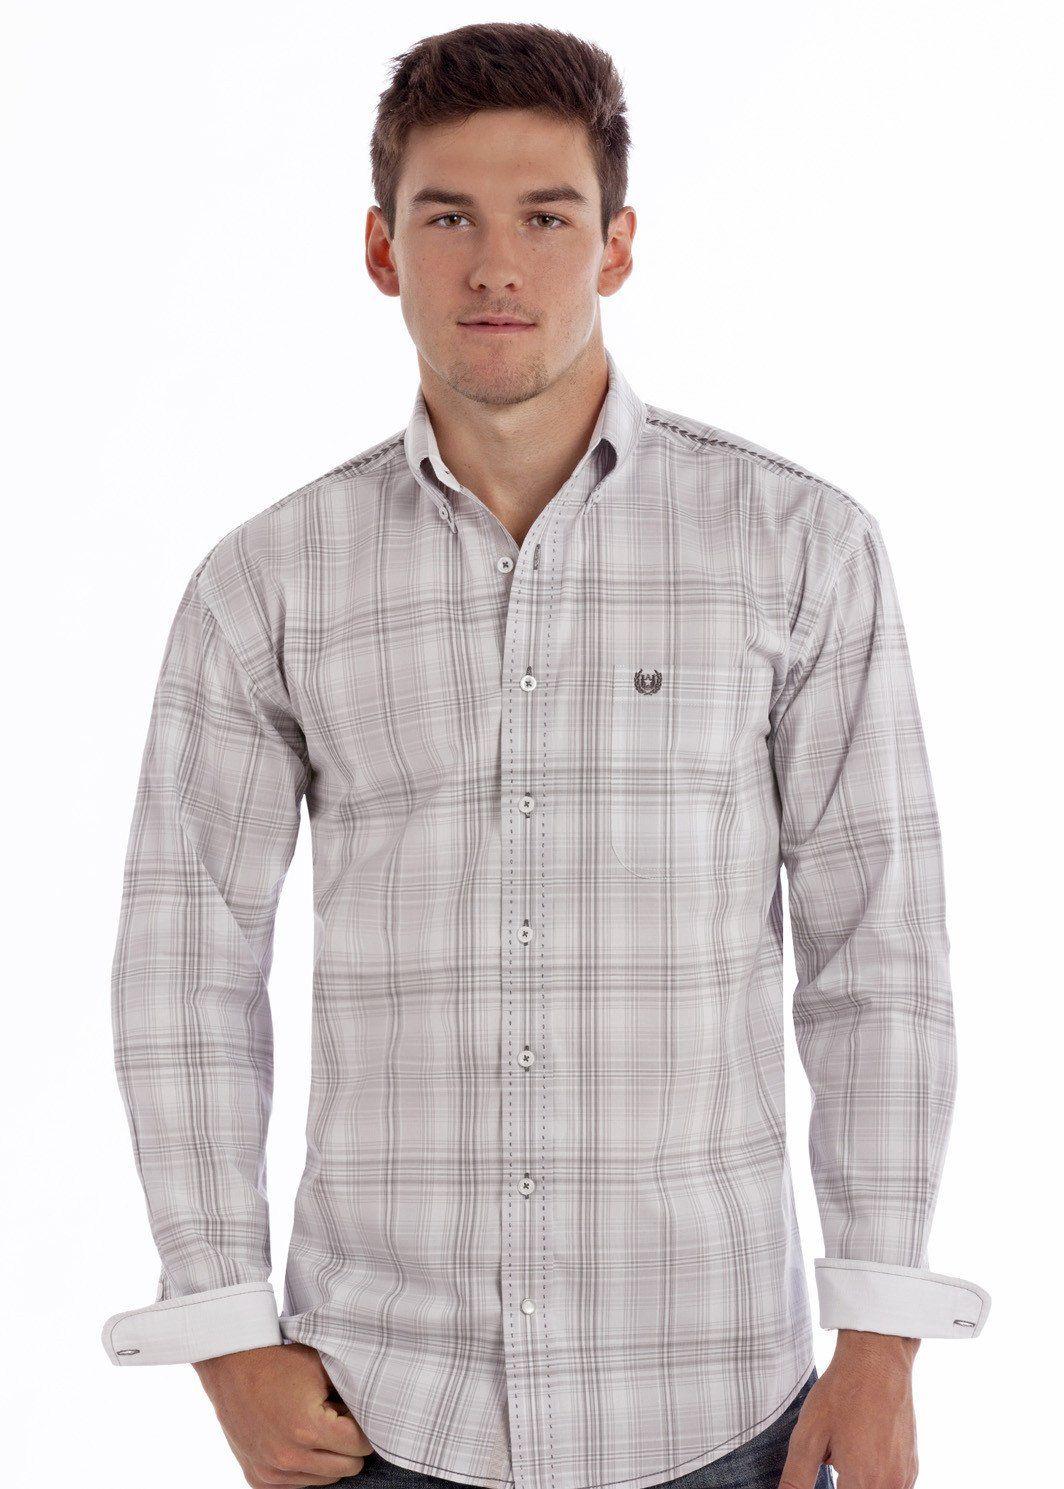 Rough stock menus plaid western long sleeve button up shirt rg